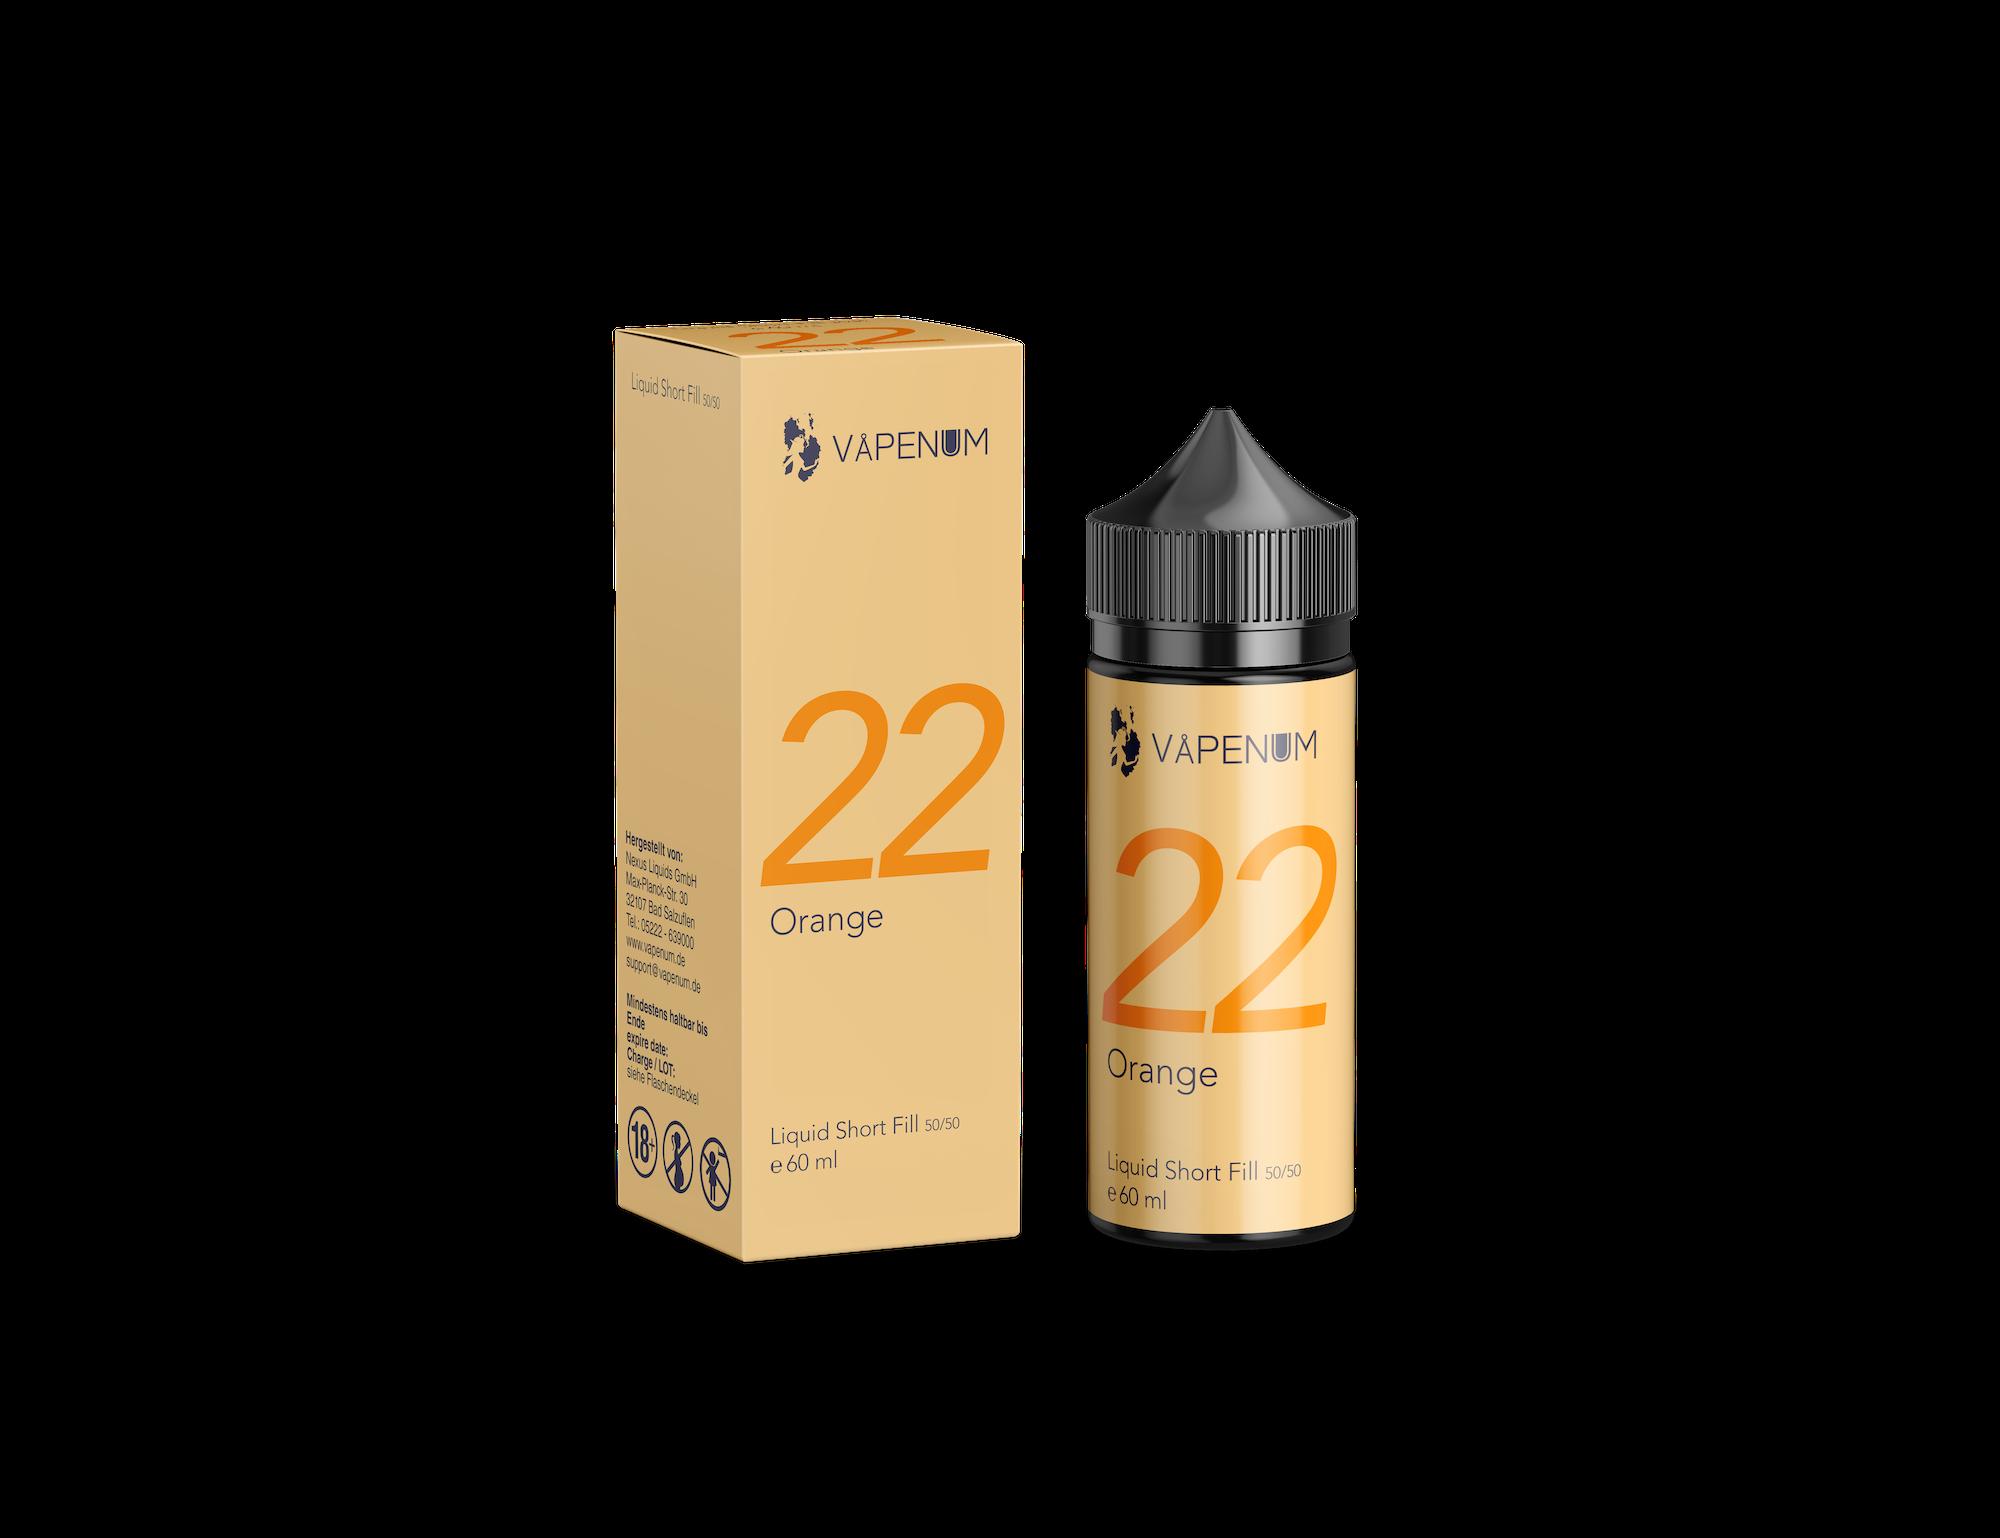 Vapenum Shortfill 22 - Orange